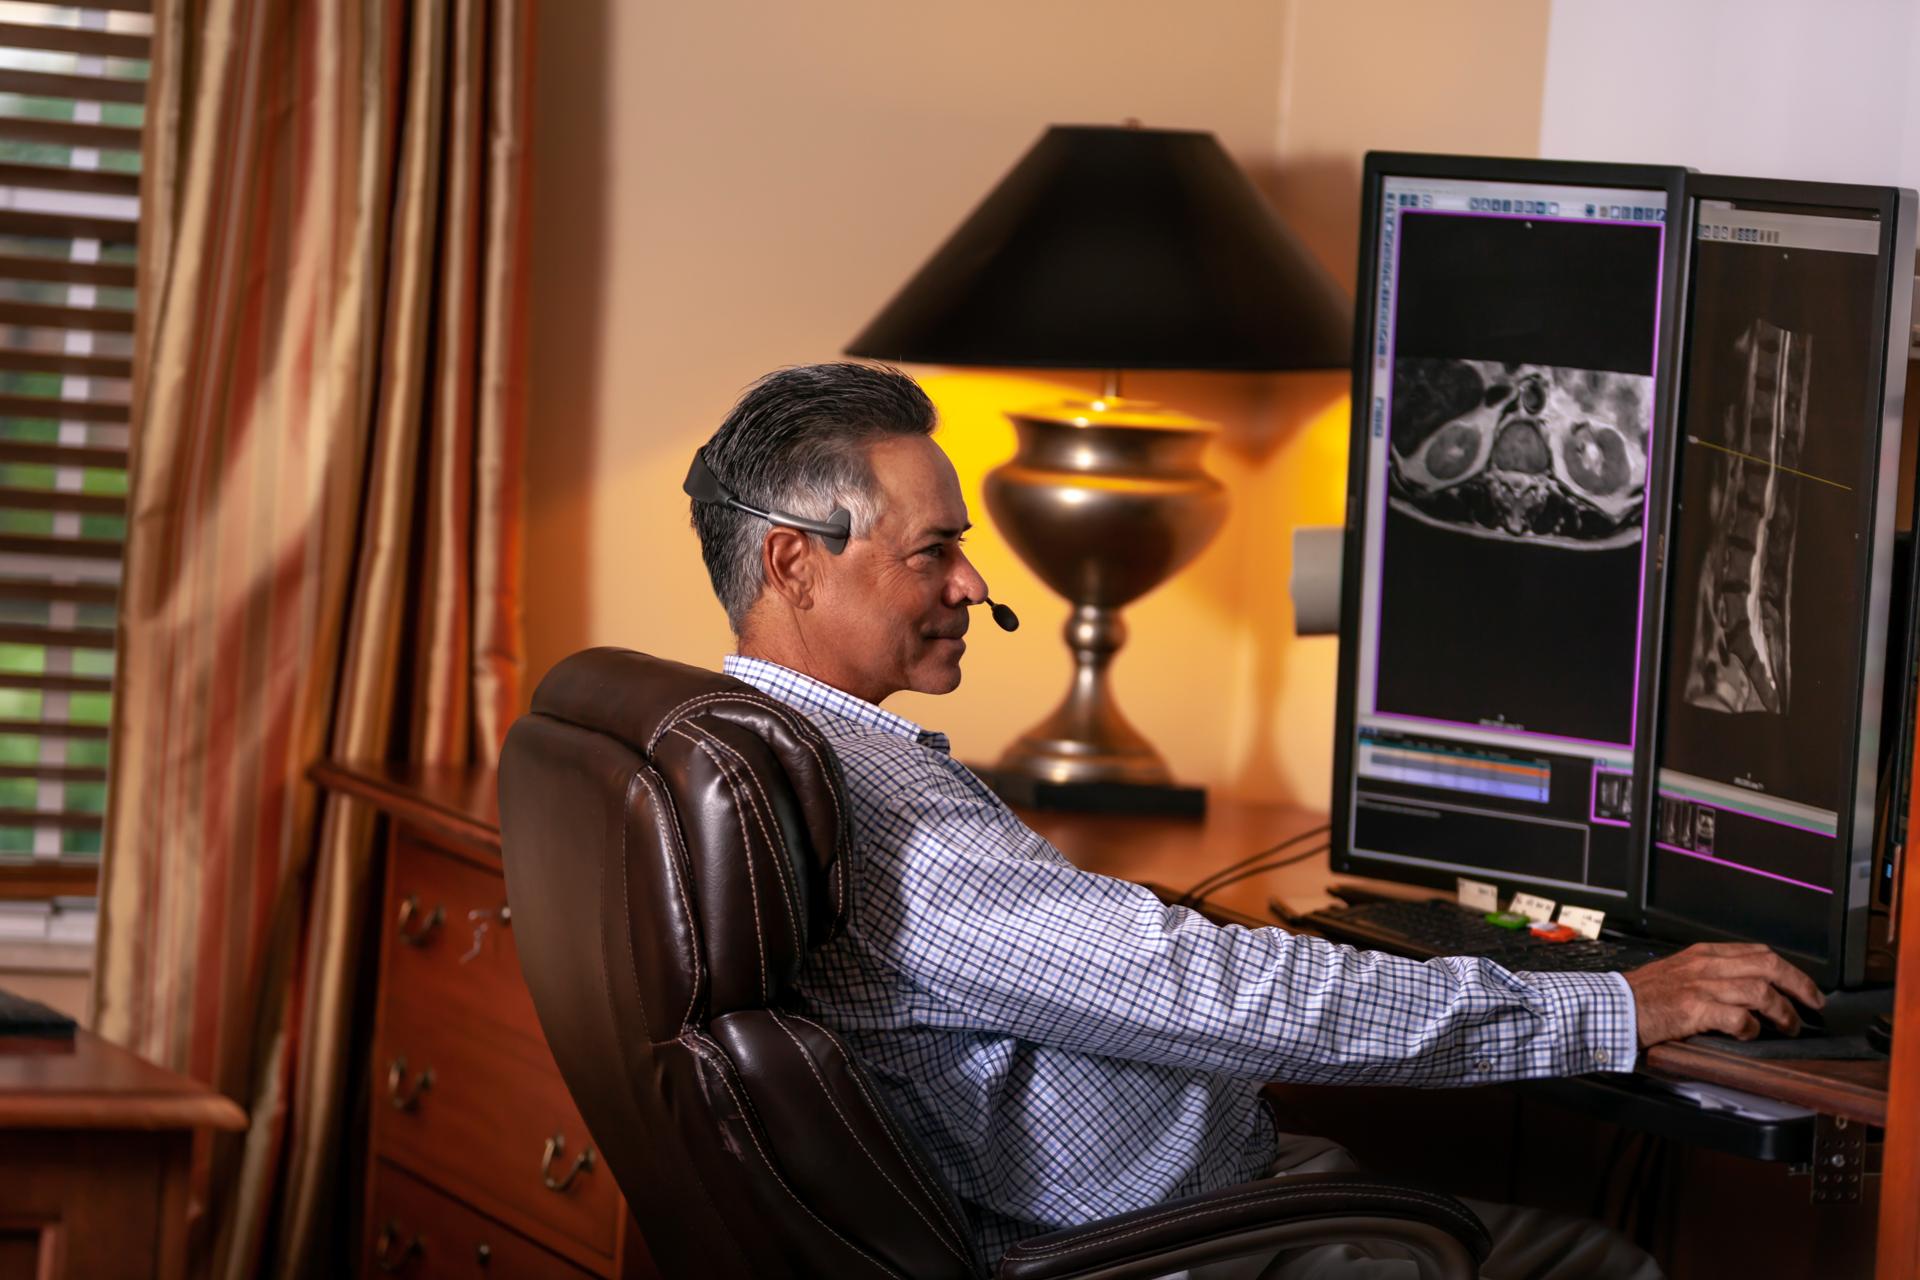 Meet the Team - Premier Radiology Services